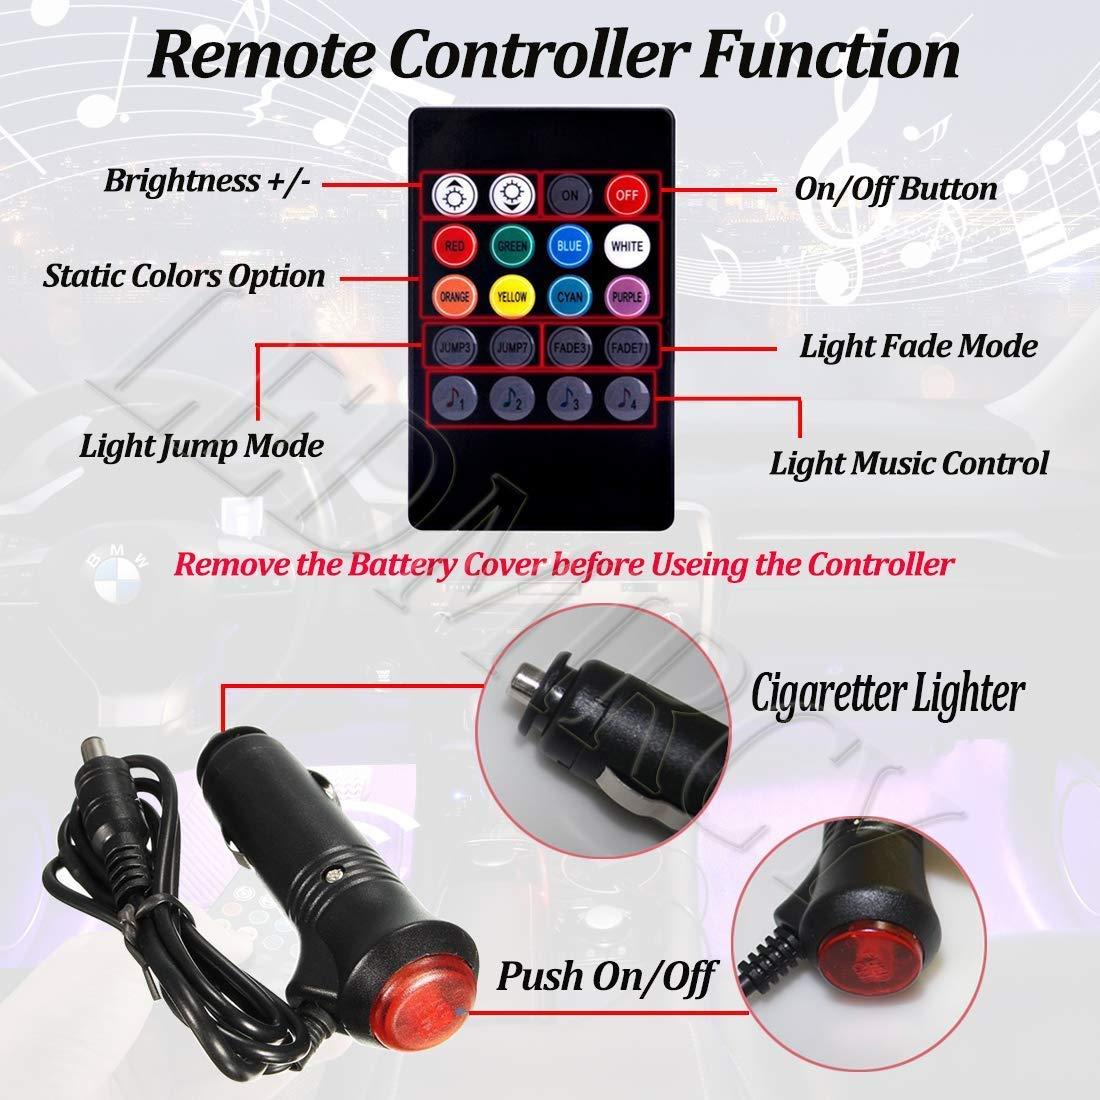 Auto LED-Strip-Leuchten 48 LED 12V RGB Car Interior Footwell Lights LED Car Multi-Color Atmosphere Neon Lights Mit Sound Active Funktion Wireless Remote Control